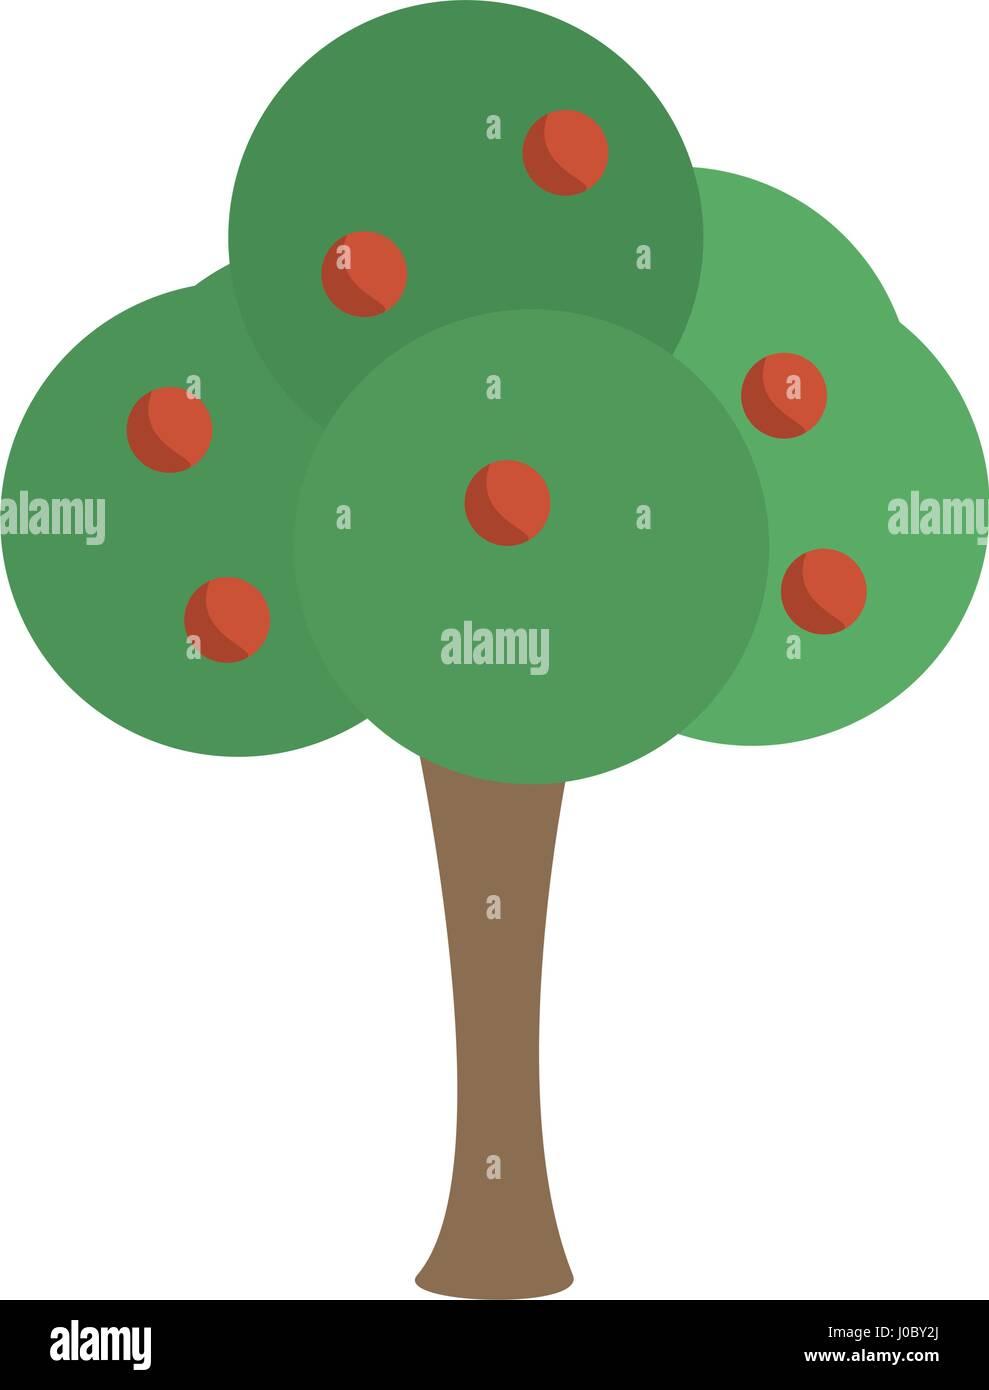 tree apple fruit nature image - Stock Vector